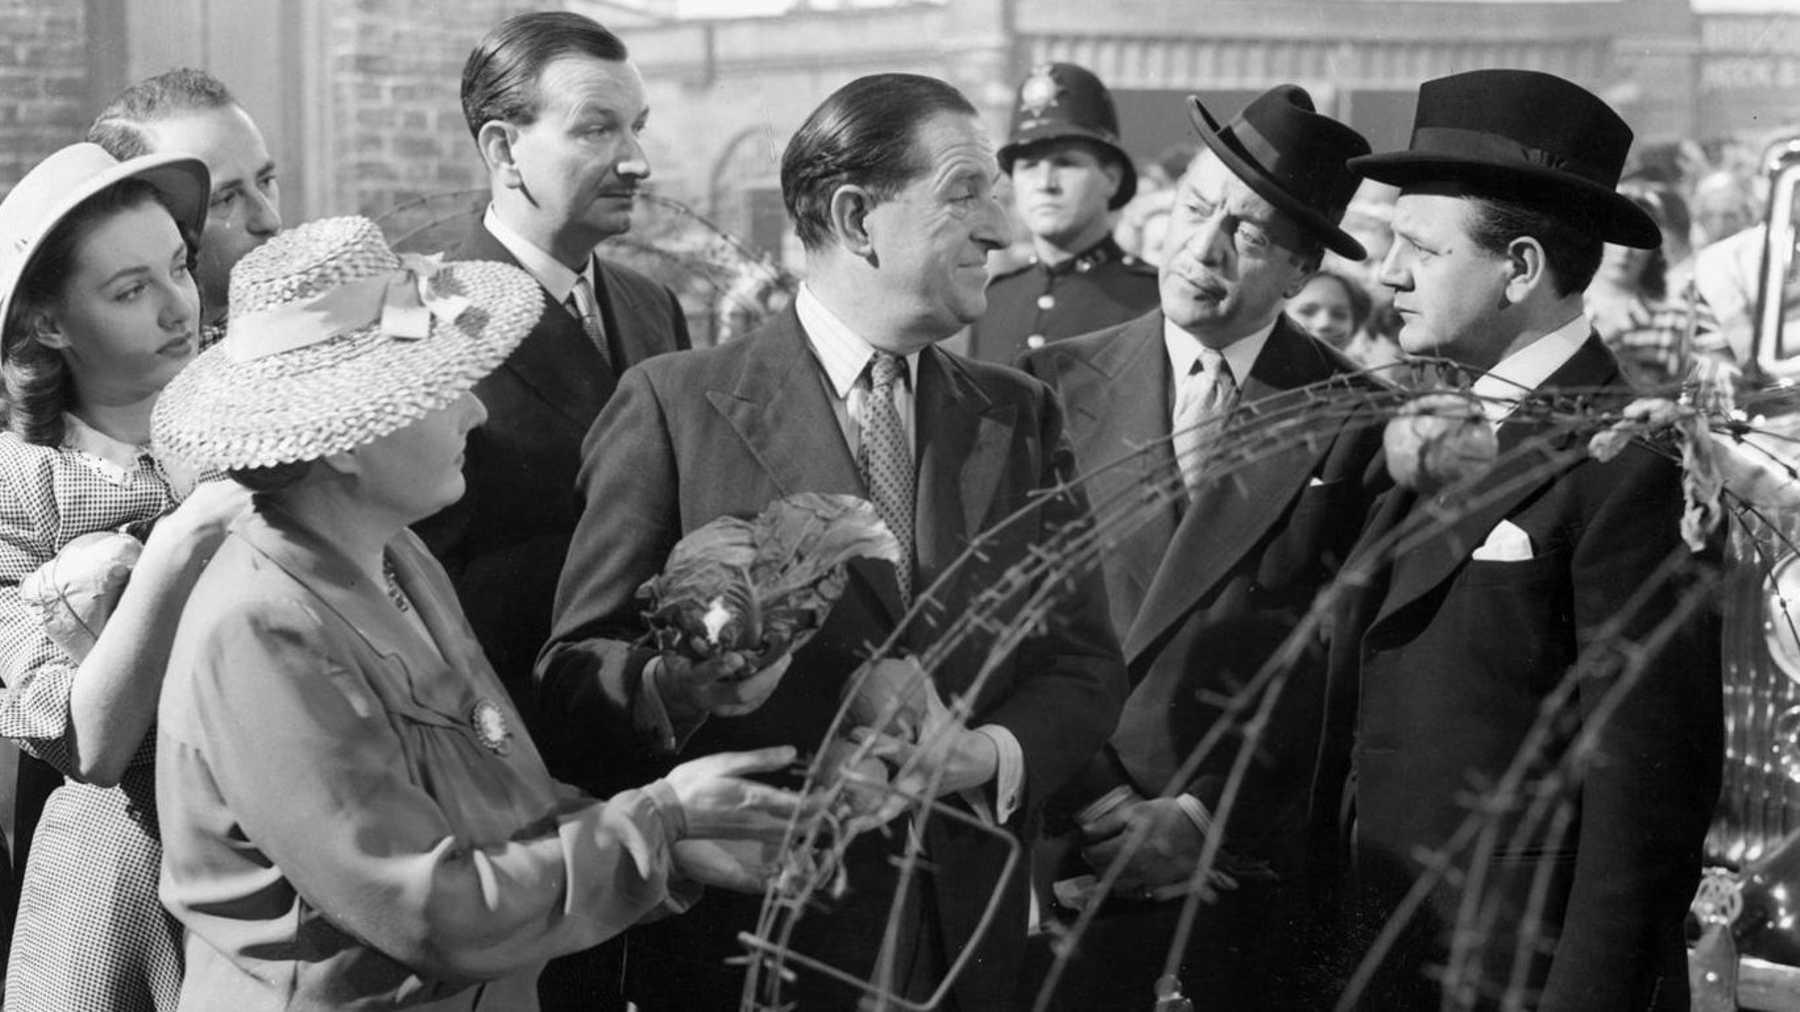 Passport to Pimlico (1949)